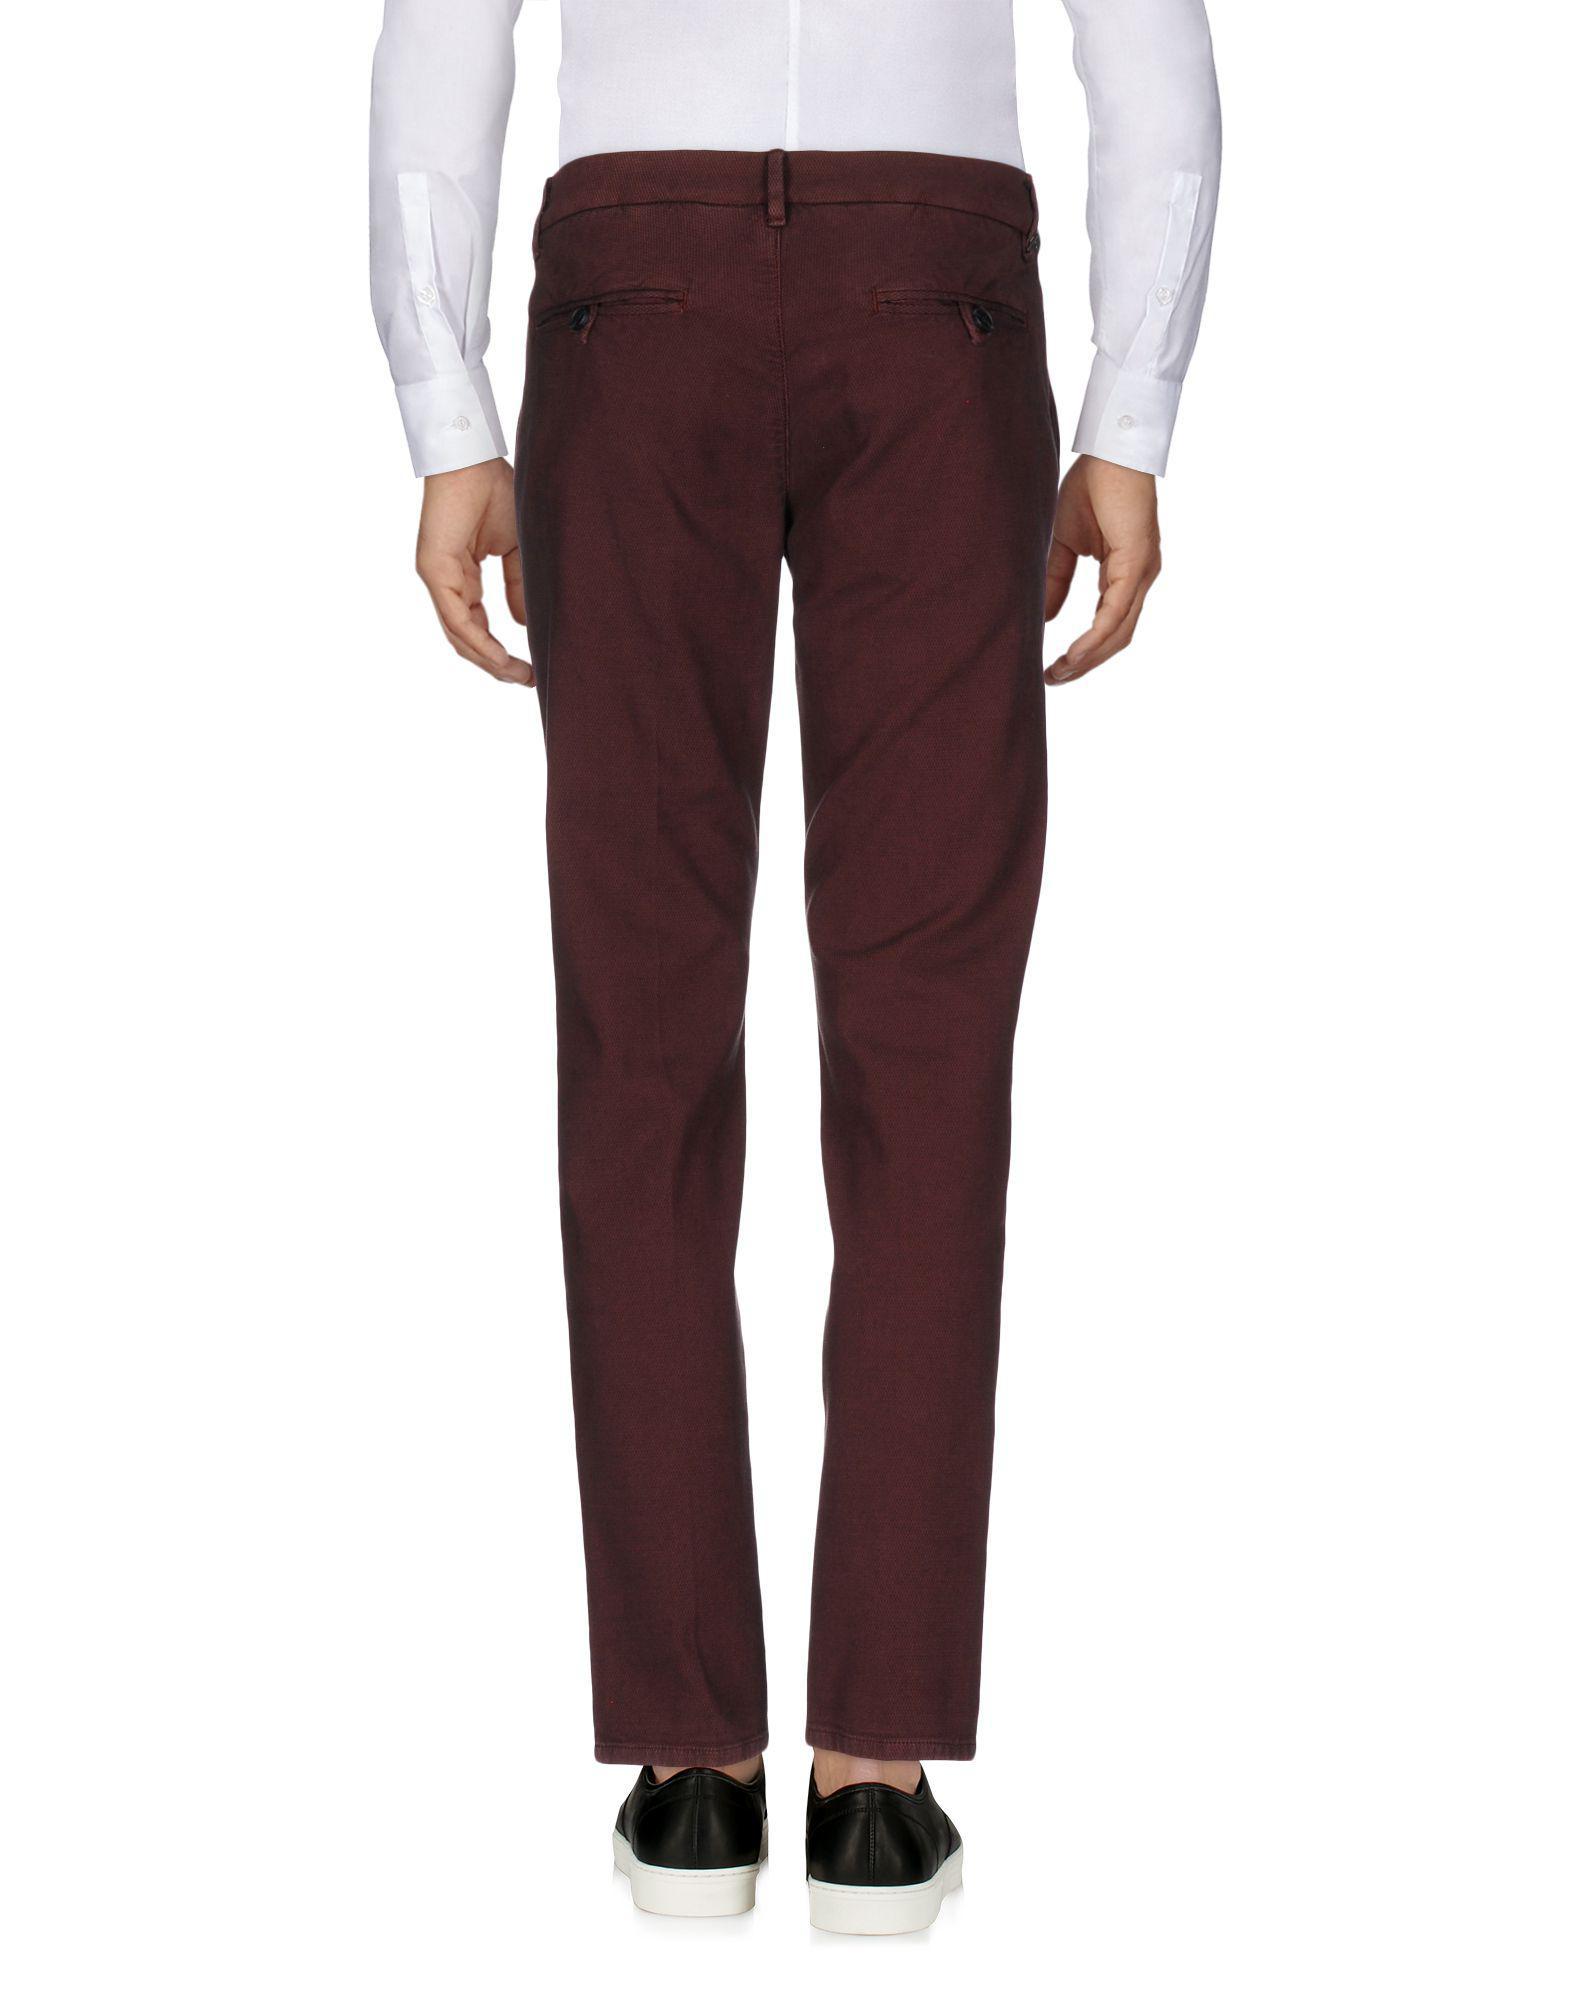 Antony Morato Cotton Casual Pants in Maroon (Purple) for Men